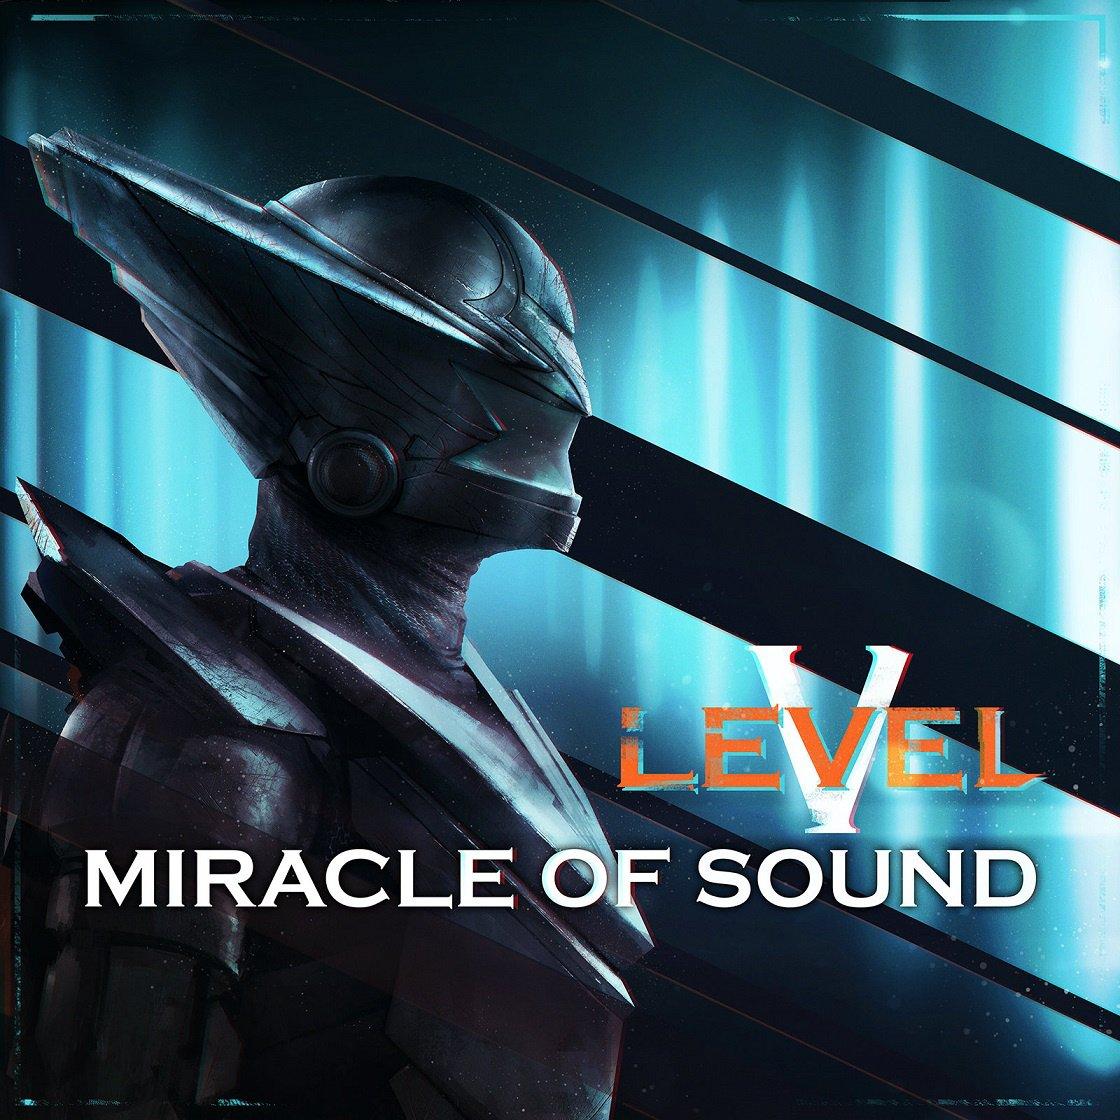 Miracle of sound level 5 album. - Изображение 1